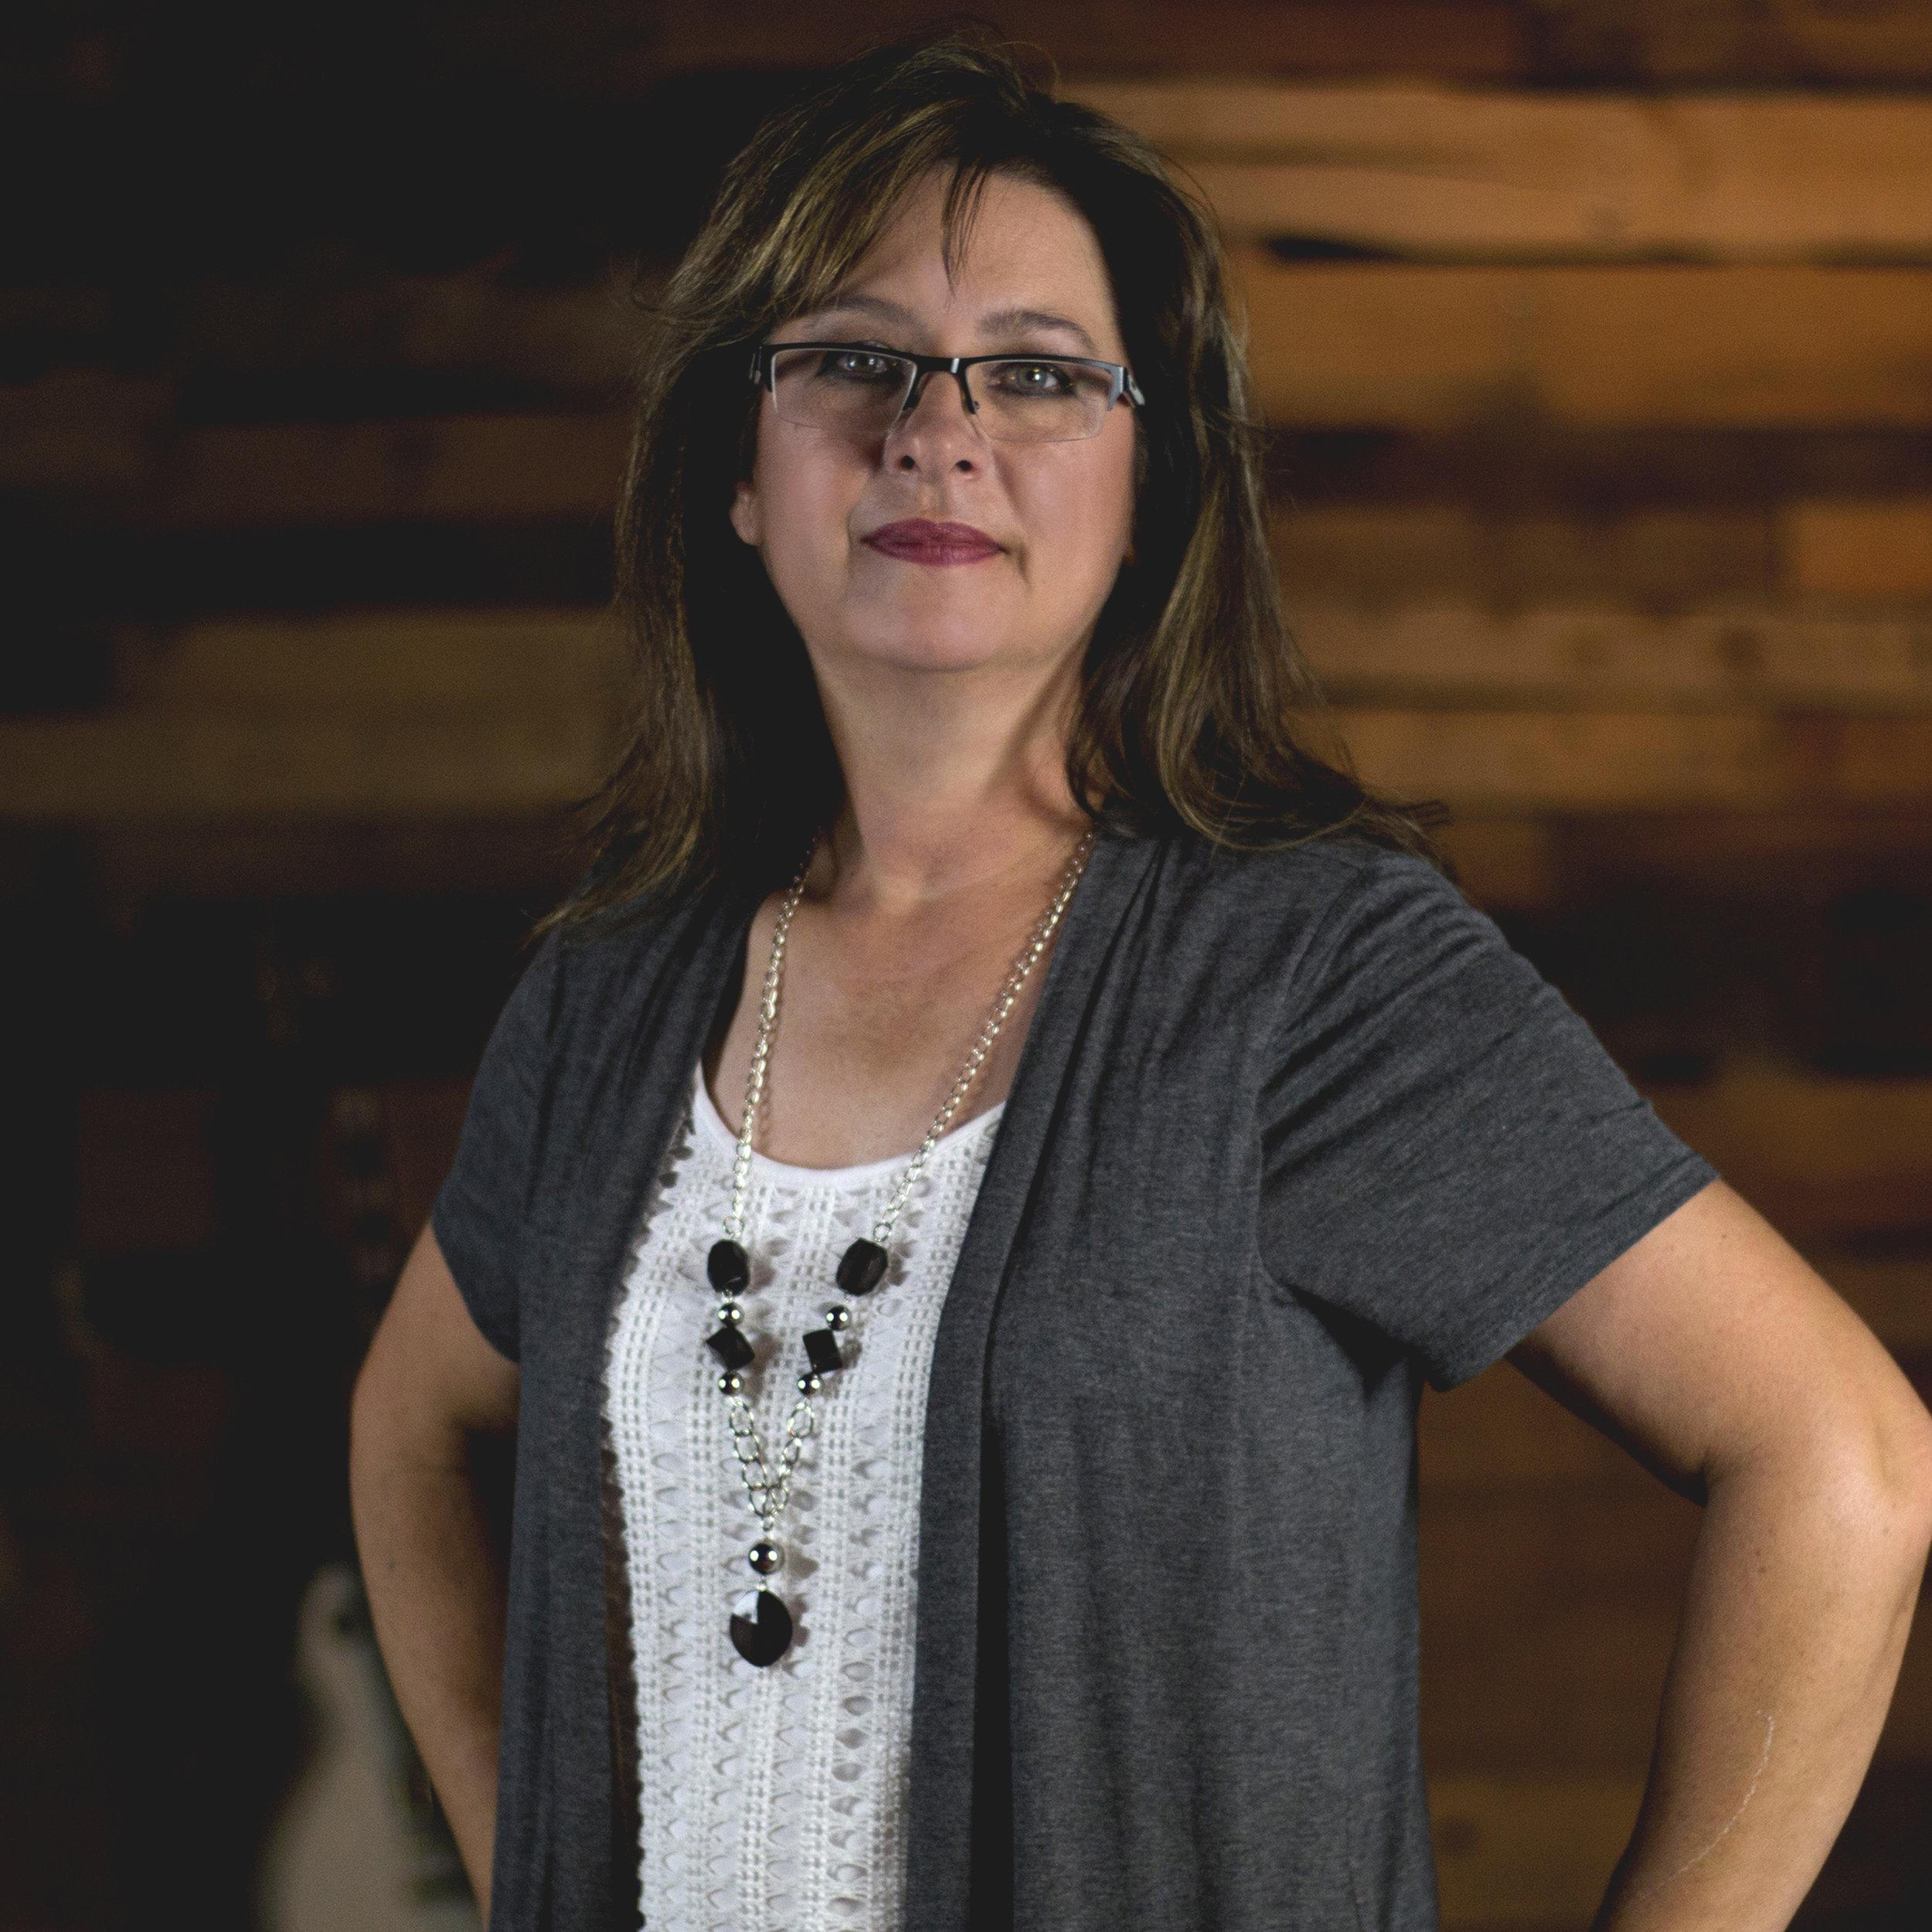 MYLISA GAINES - Executive Staff/Co-Lead Pastor